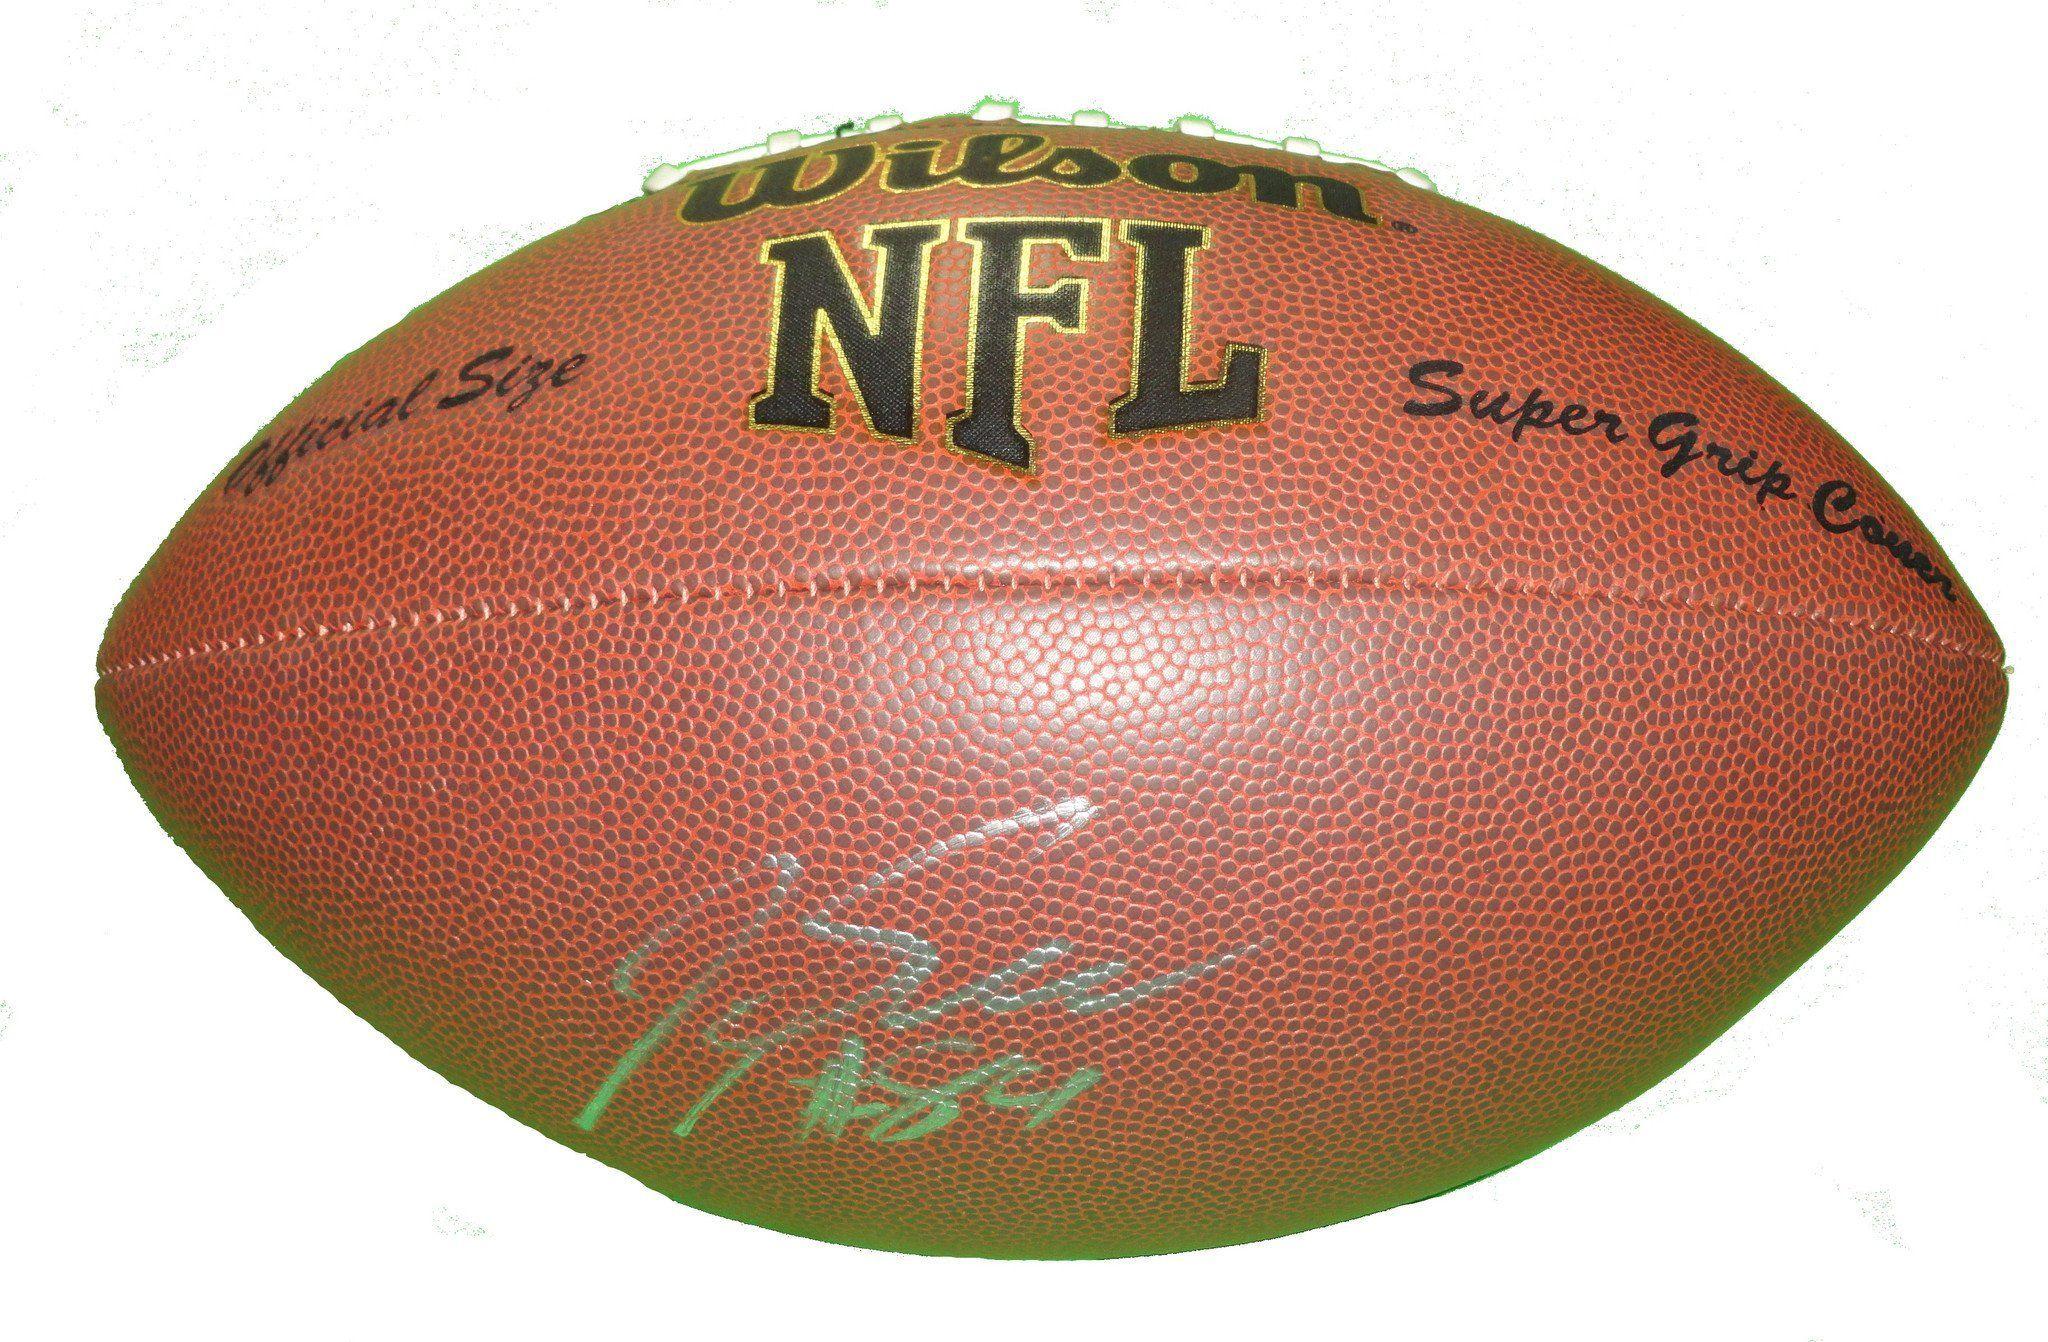 Jermaine gresham autographed nfl wilson composite football